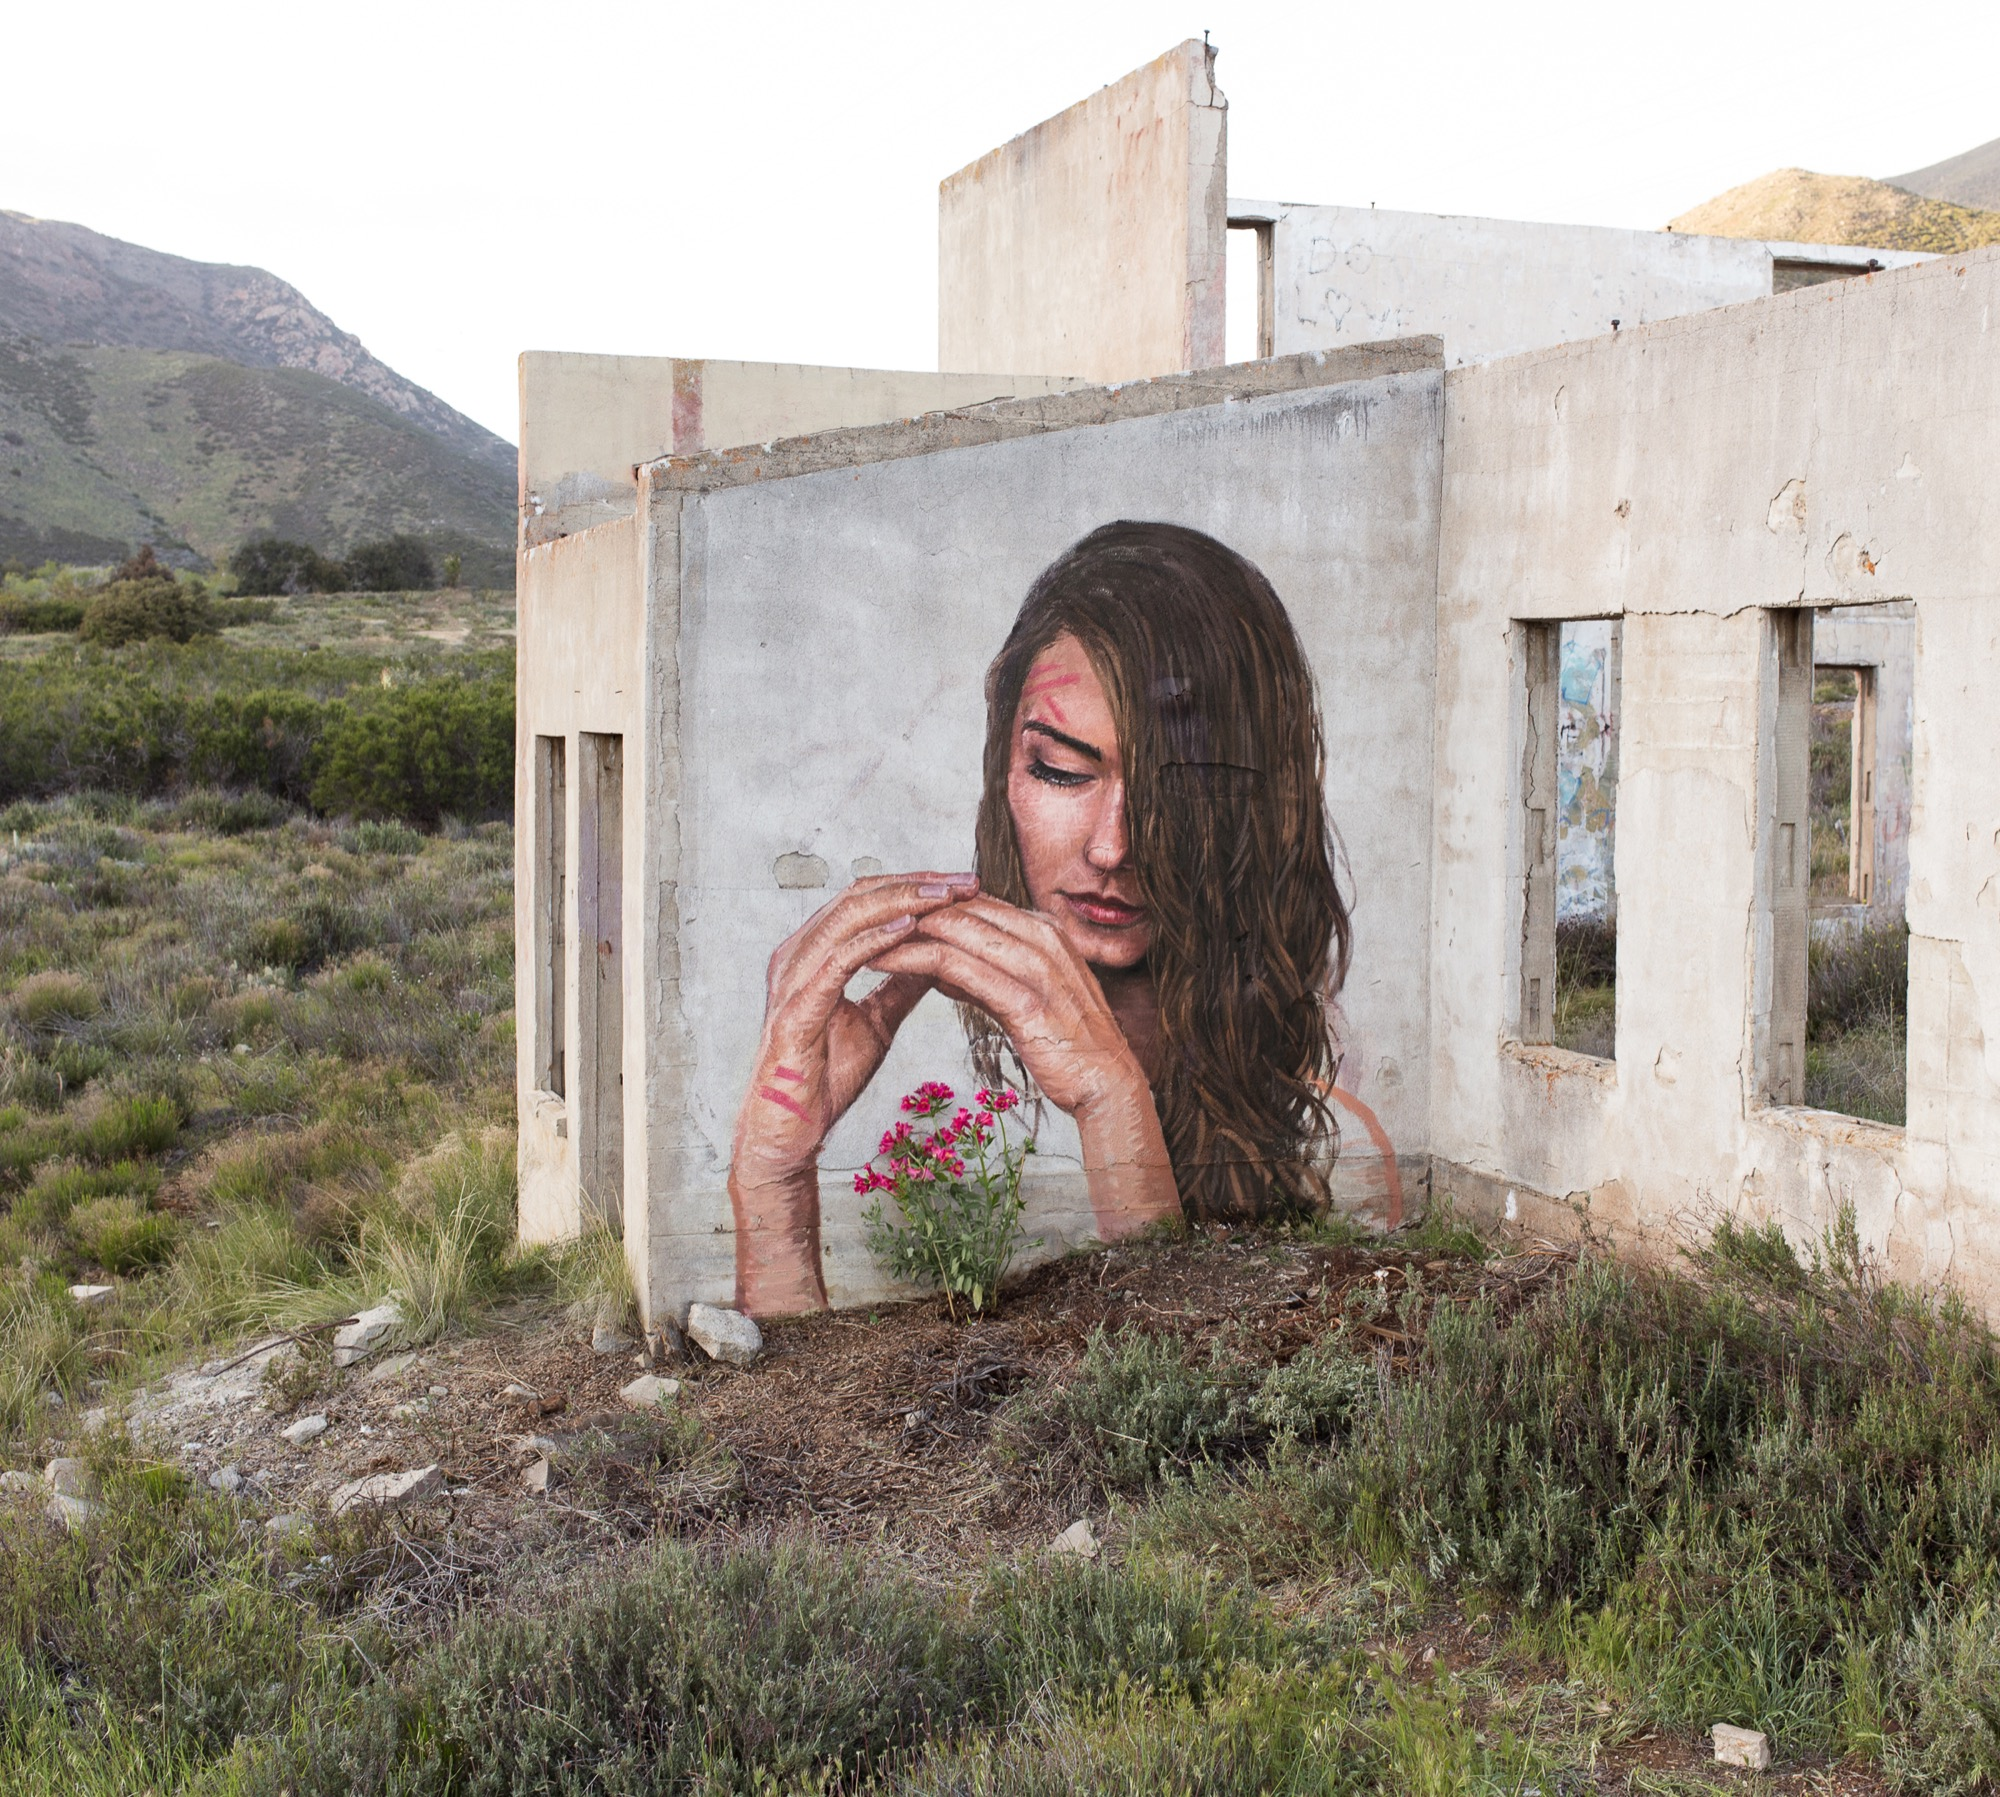 """Mālama"" by Hula in North America - the vandallist (1)"